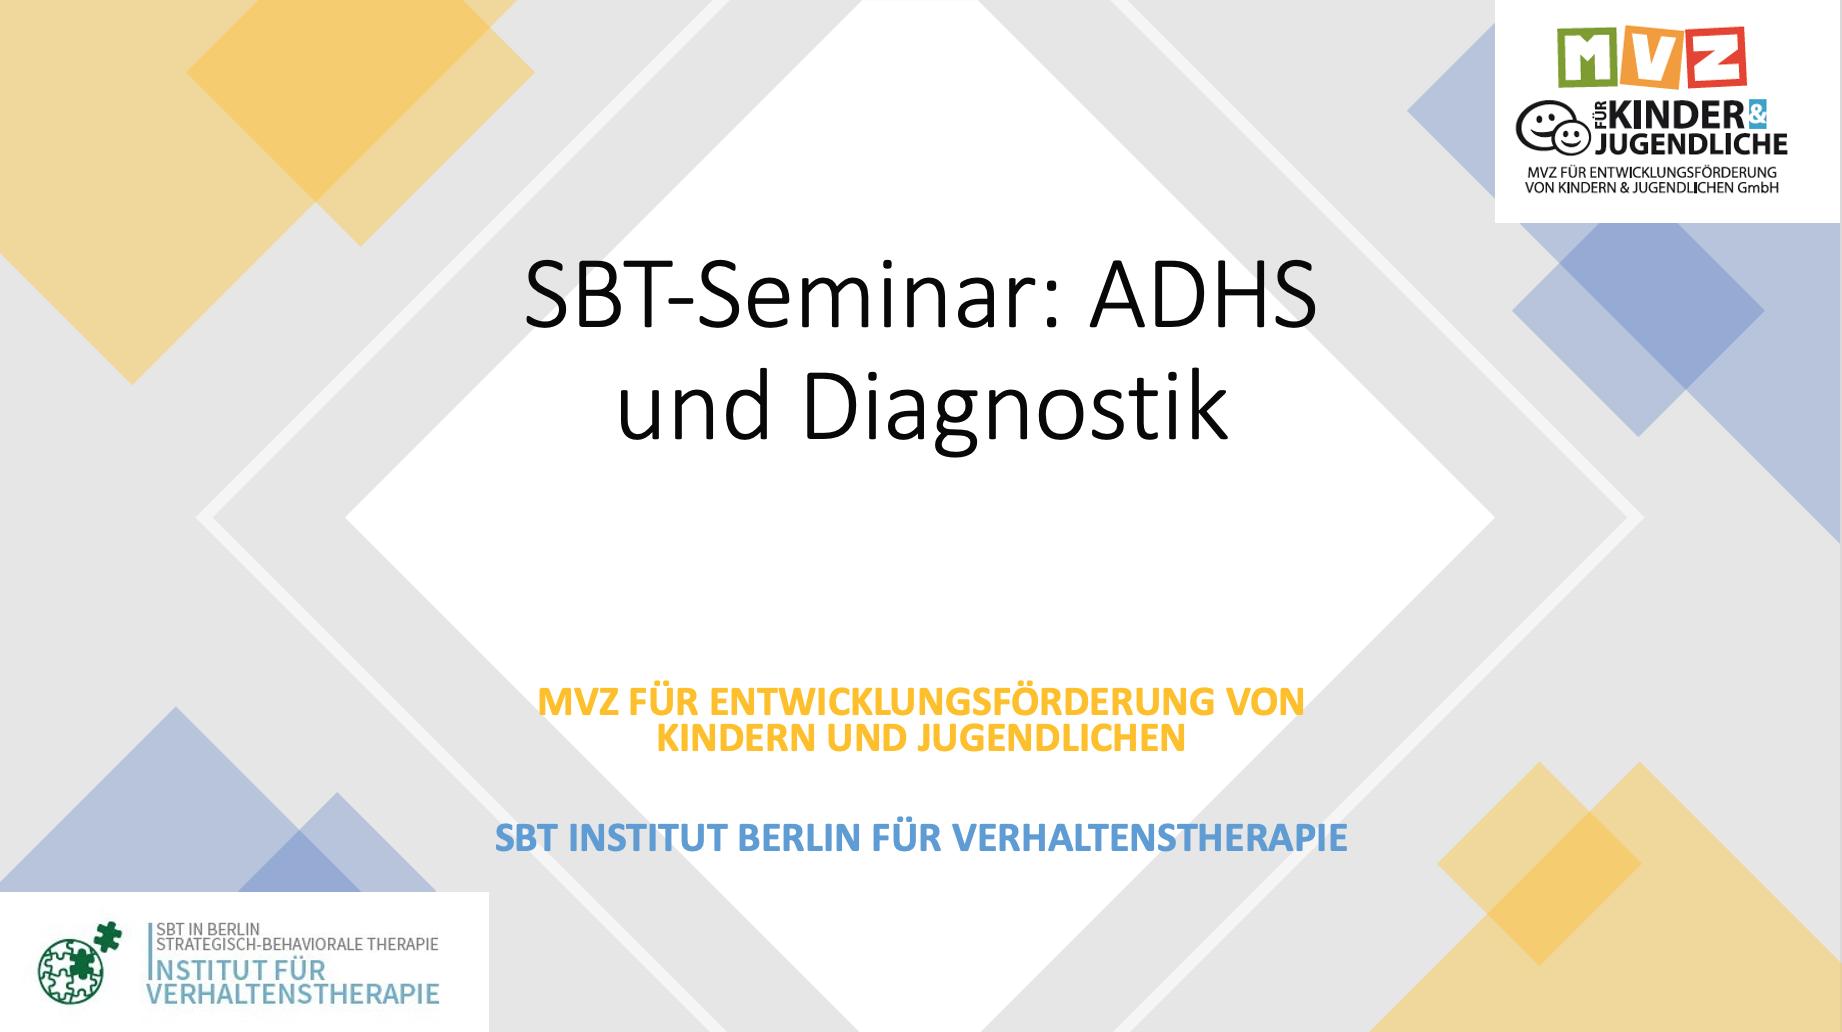 SBT Seminar: ADHS und Diagnostik